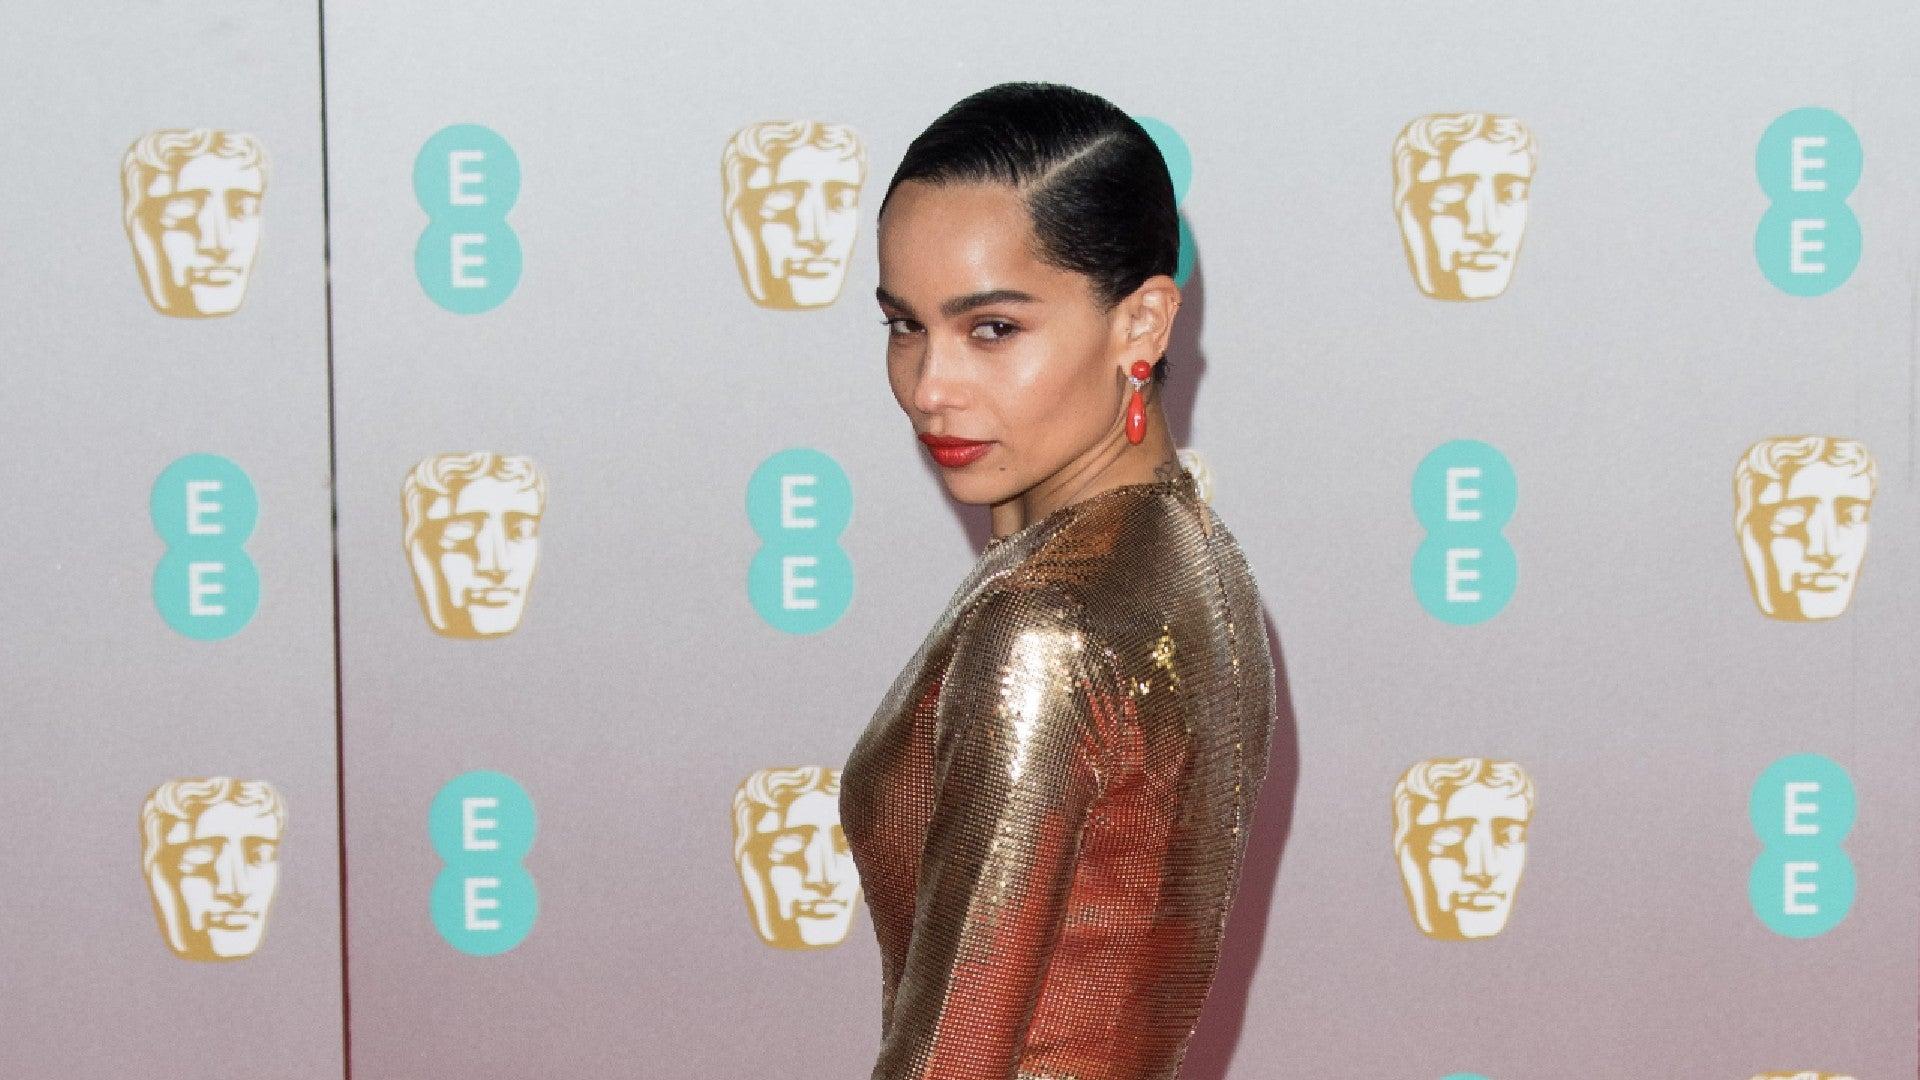 Zoë Kravitz's Sexy Short Cut Will Make You Rethink Long Hair